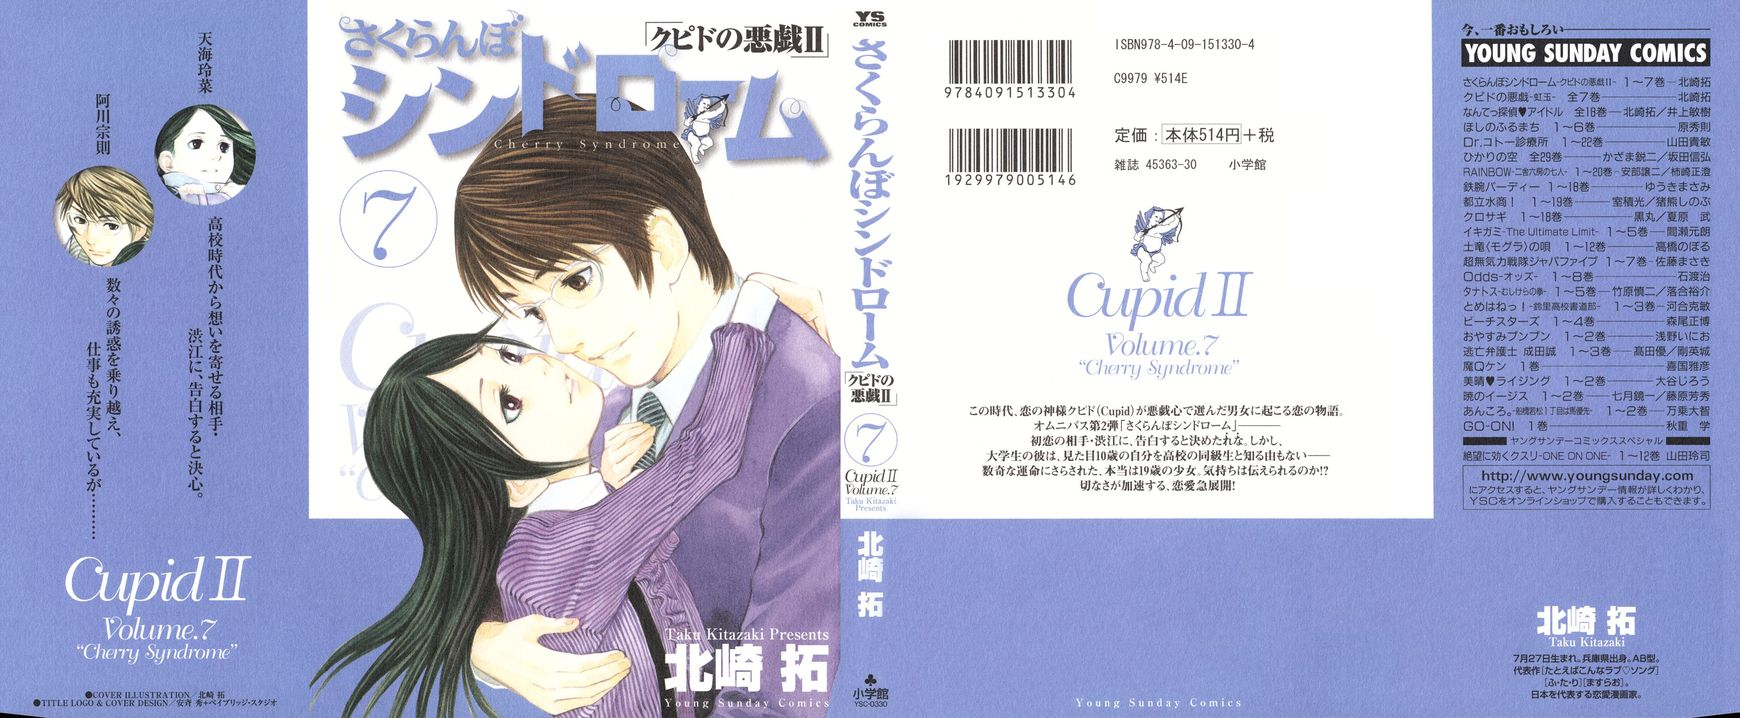 Sakuranbo Syndrome 59 Page 1